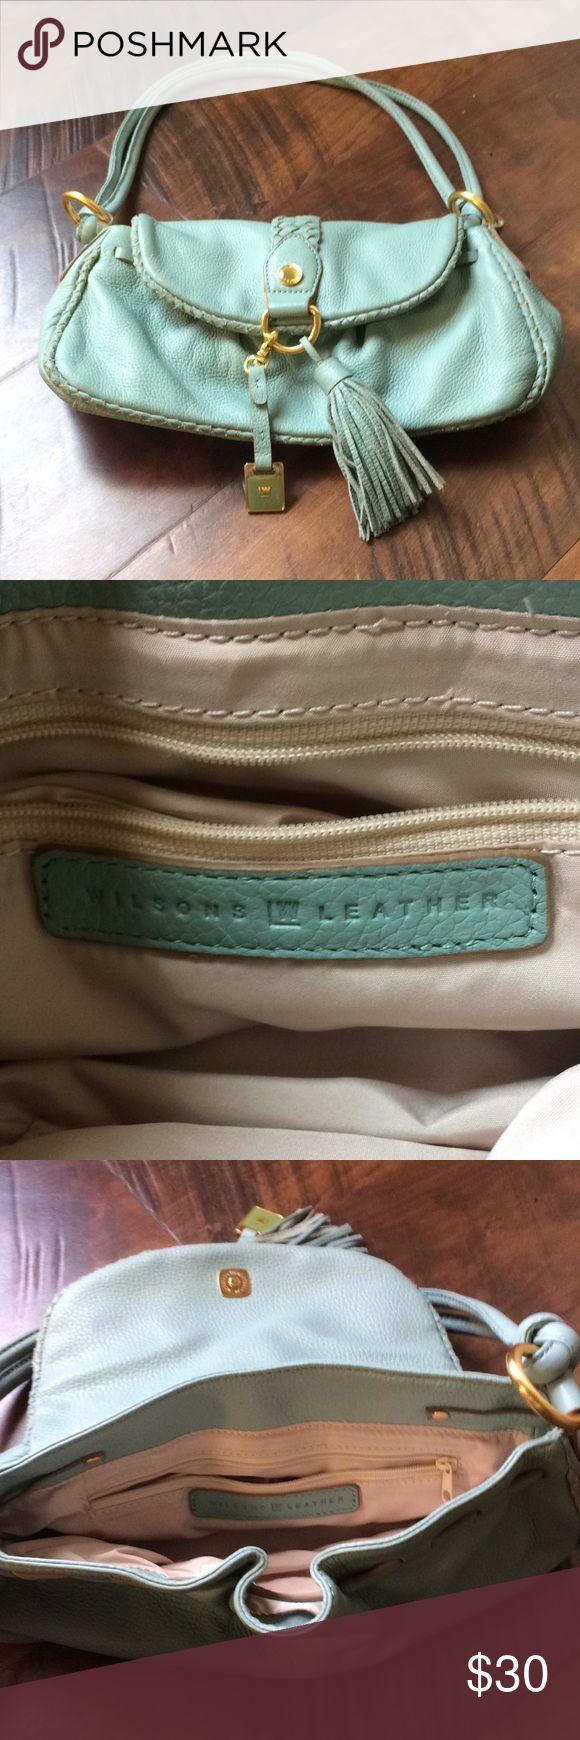 Wilson Leather light teal handbag Beautiful, Wilson